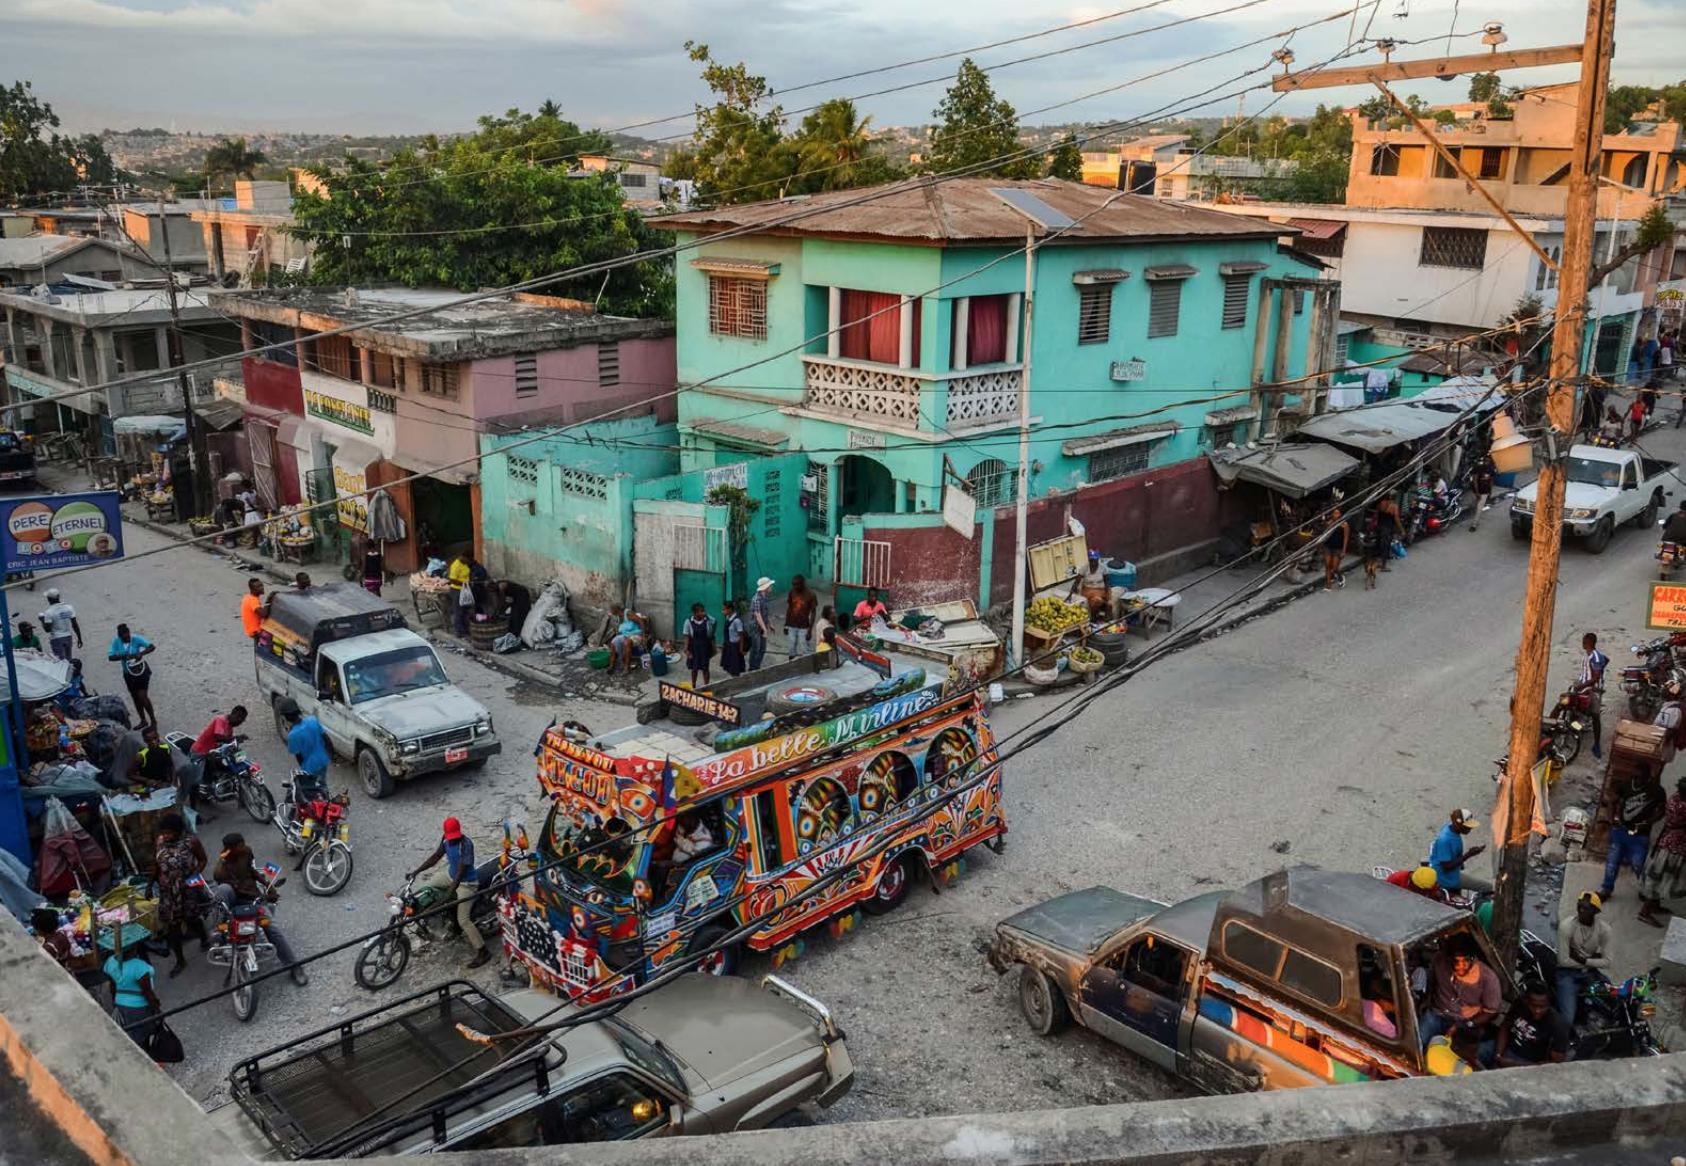 Image of the Carrefour Feuilles neighbourhood of Port-au-Prince. (Courtesy of Phalonne Pierre Louis / FotoKonbit)